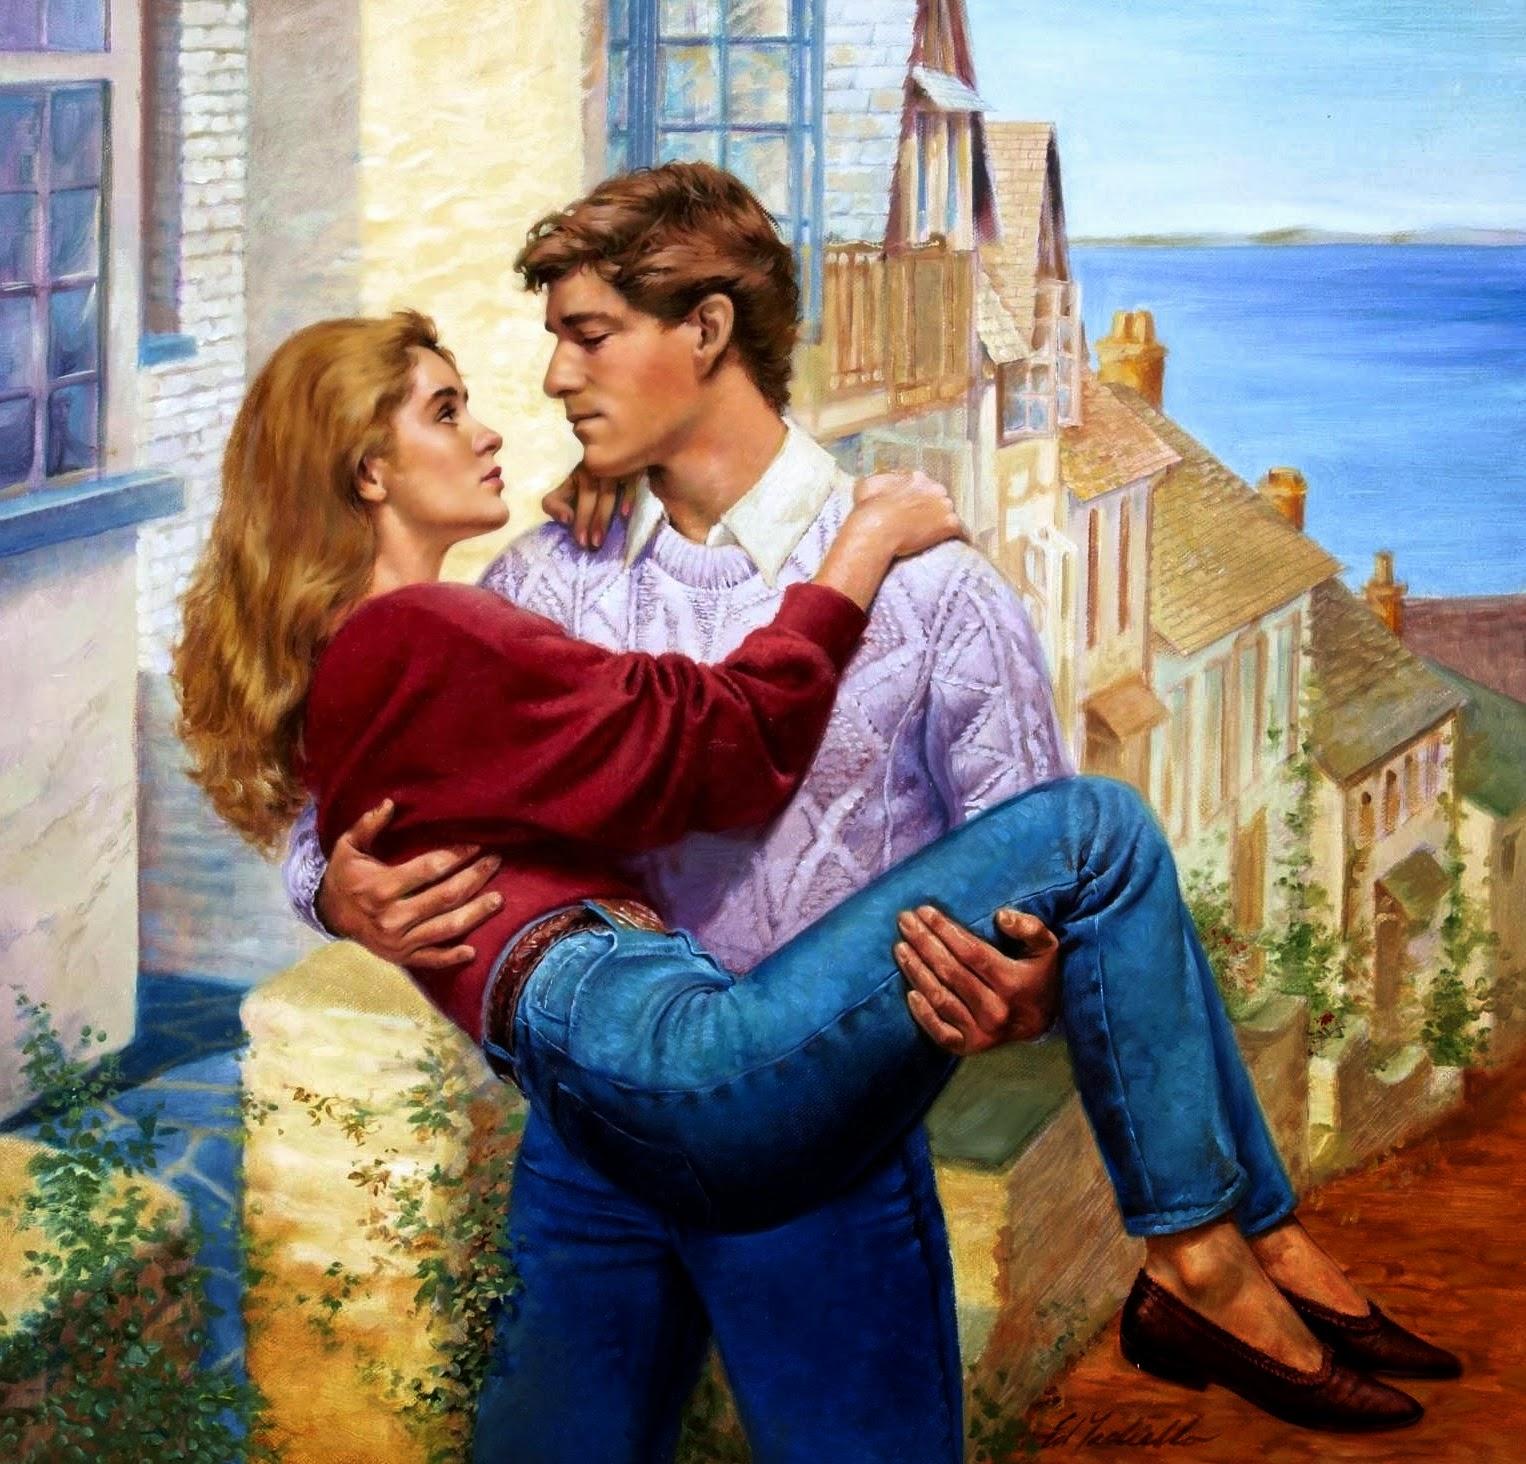 Firt time kiss lover